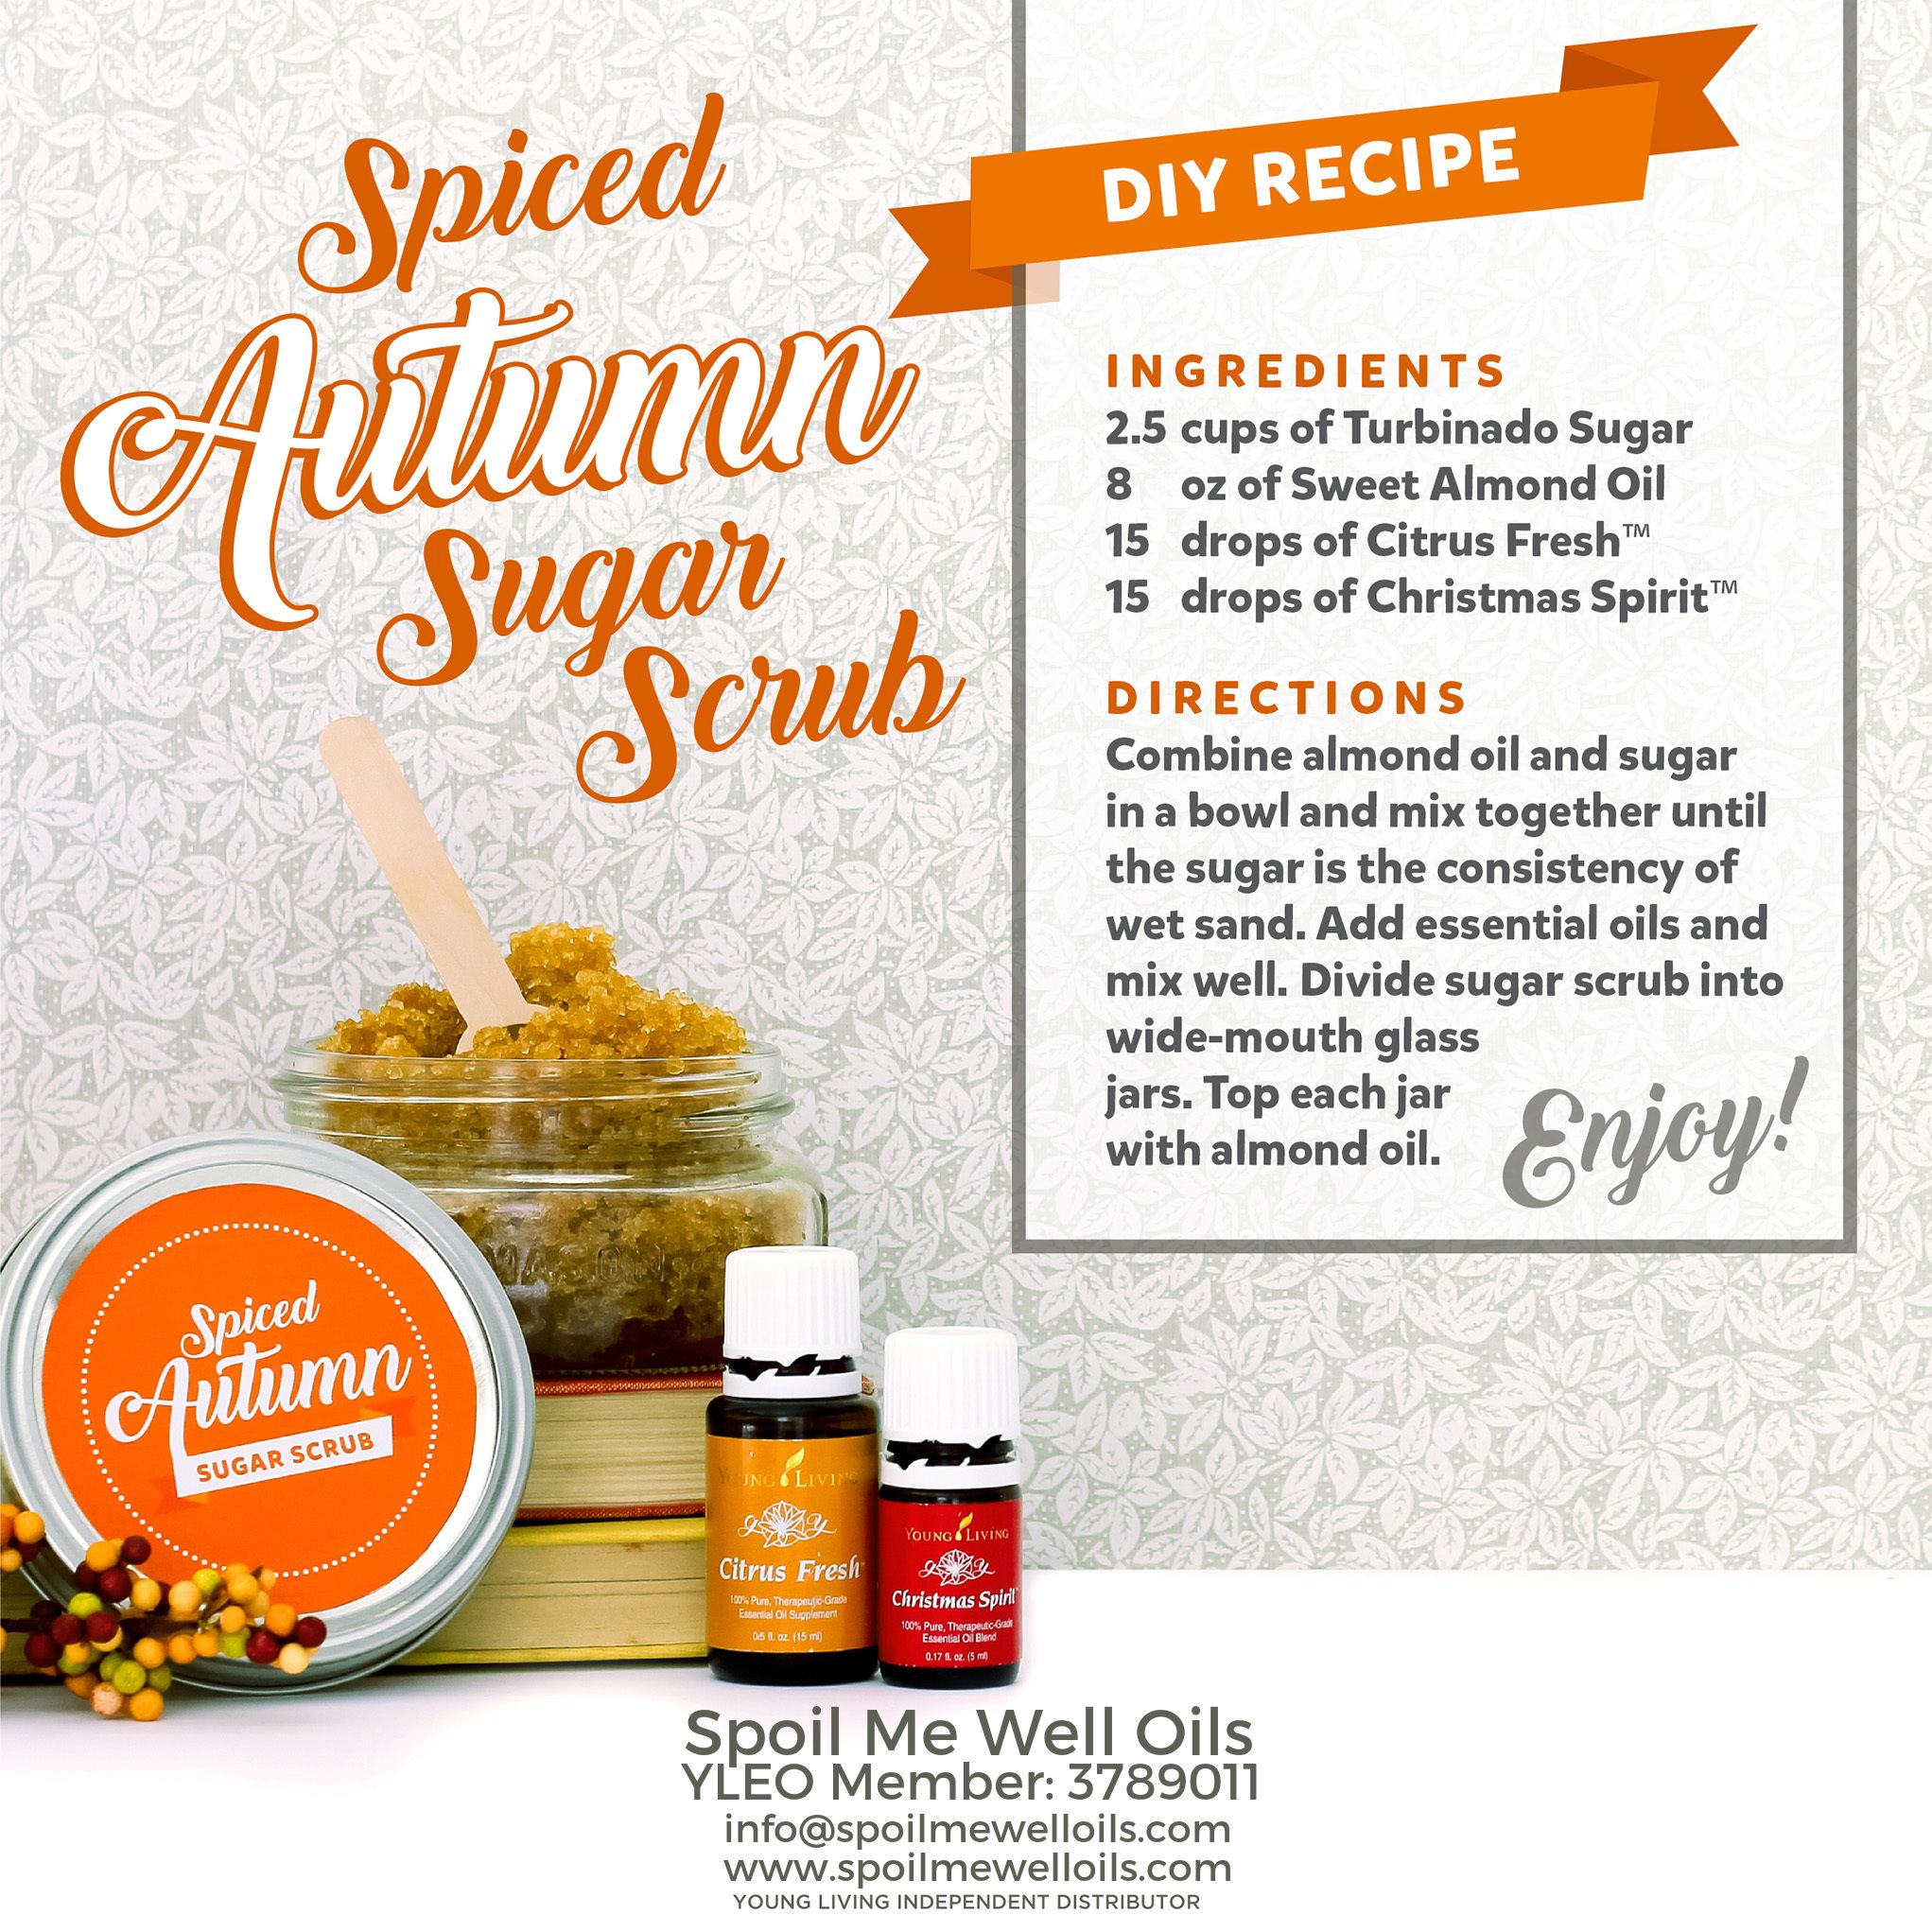 Spiced Autumn Sugar Scrub DIY Recipehow to diffuse ...